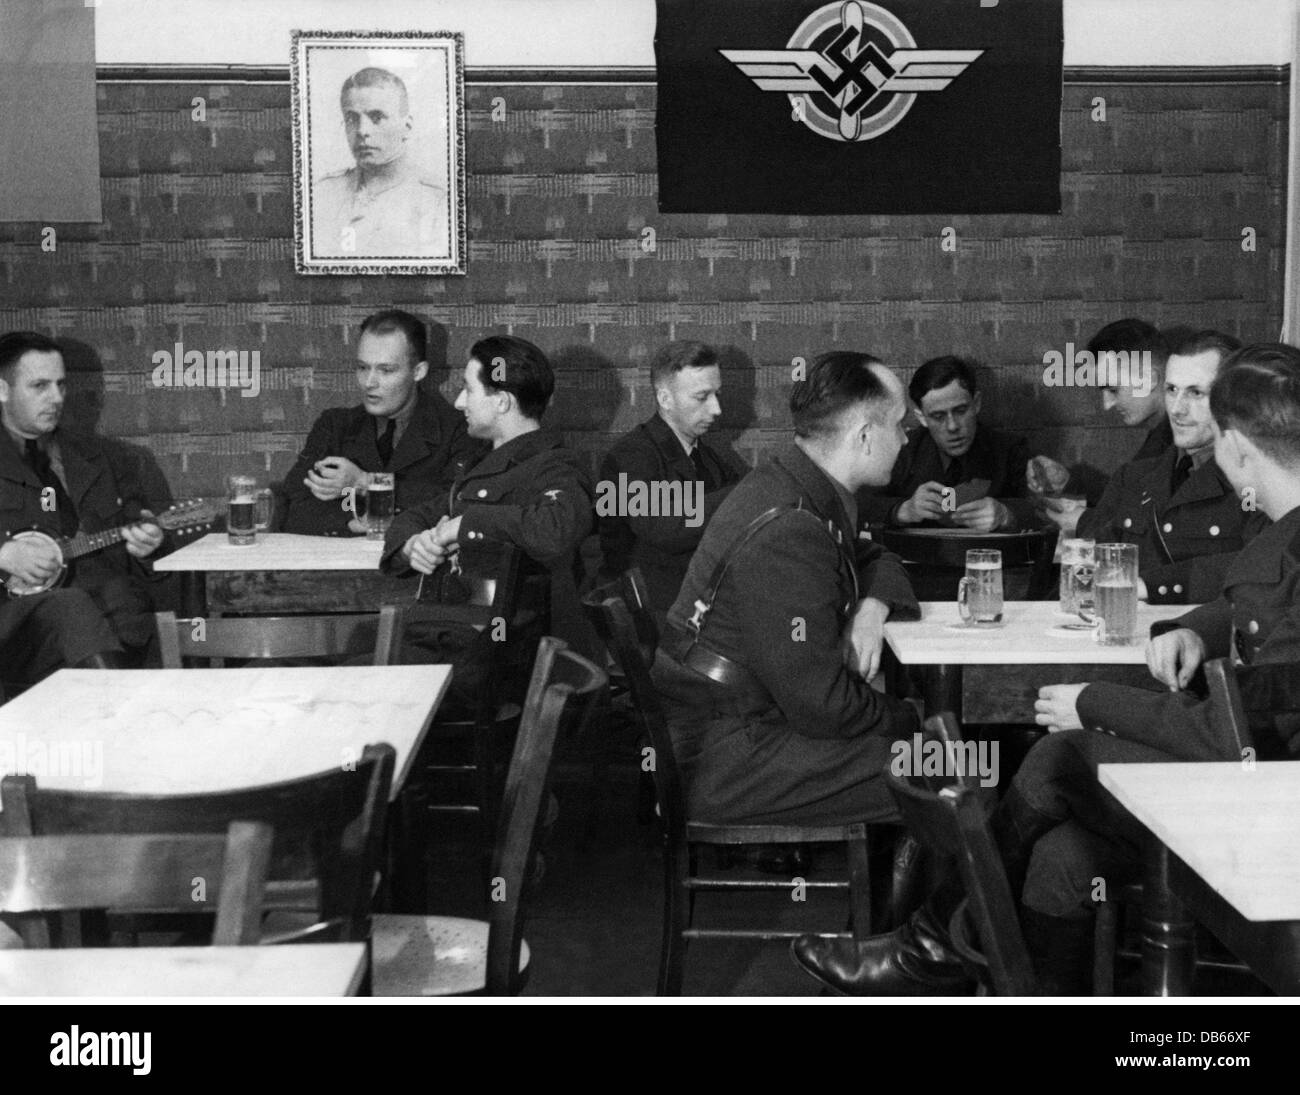 National Socialism, organisations, National Socialist Flyers Corps (Nationalsozialistisches Fliegerkorps, NSFK), - Stock Image